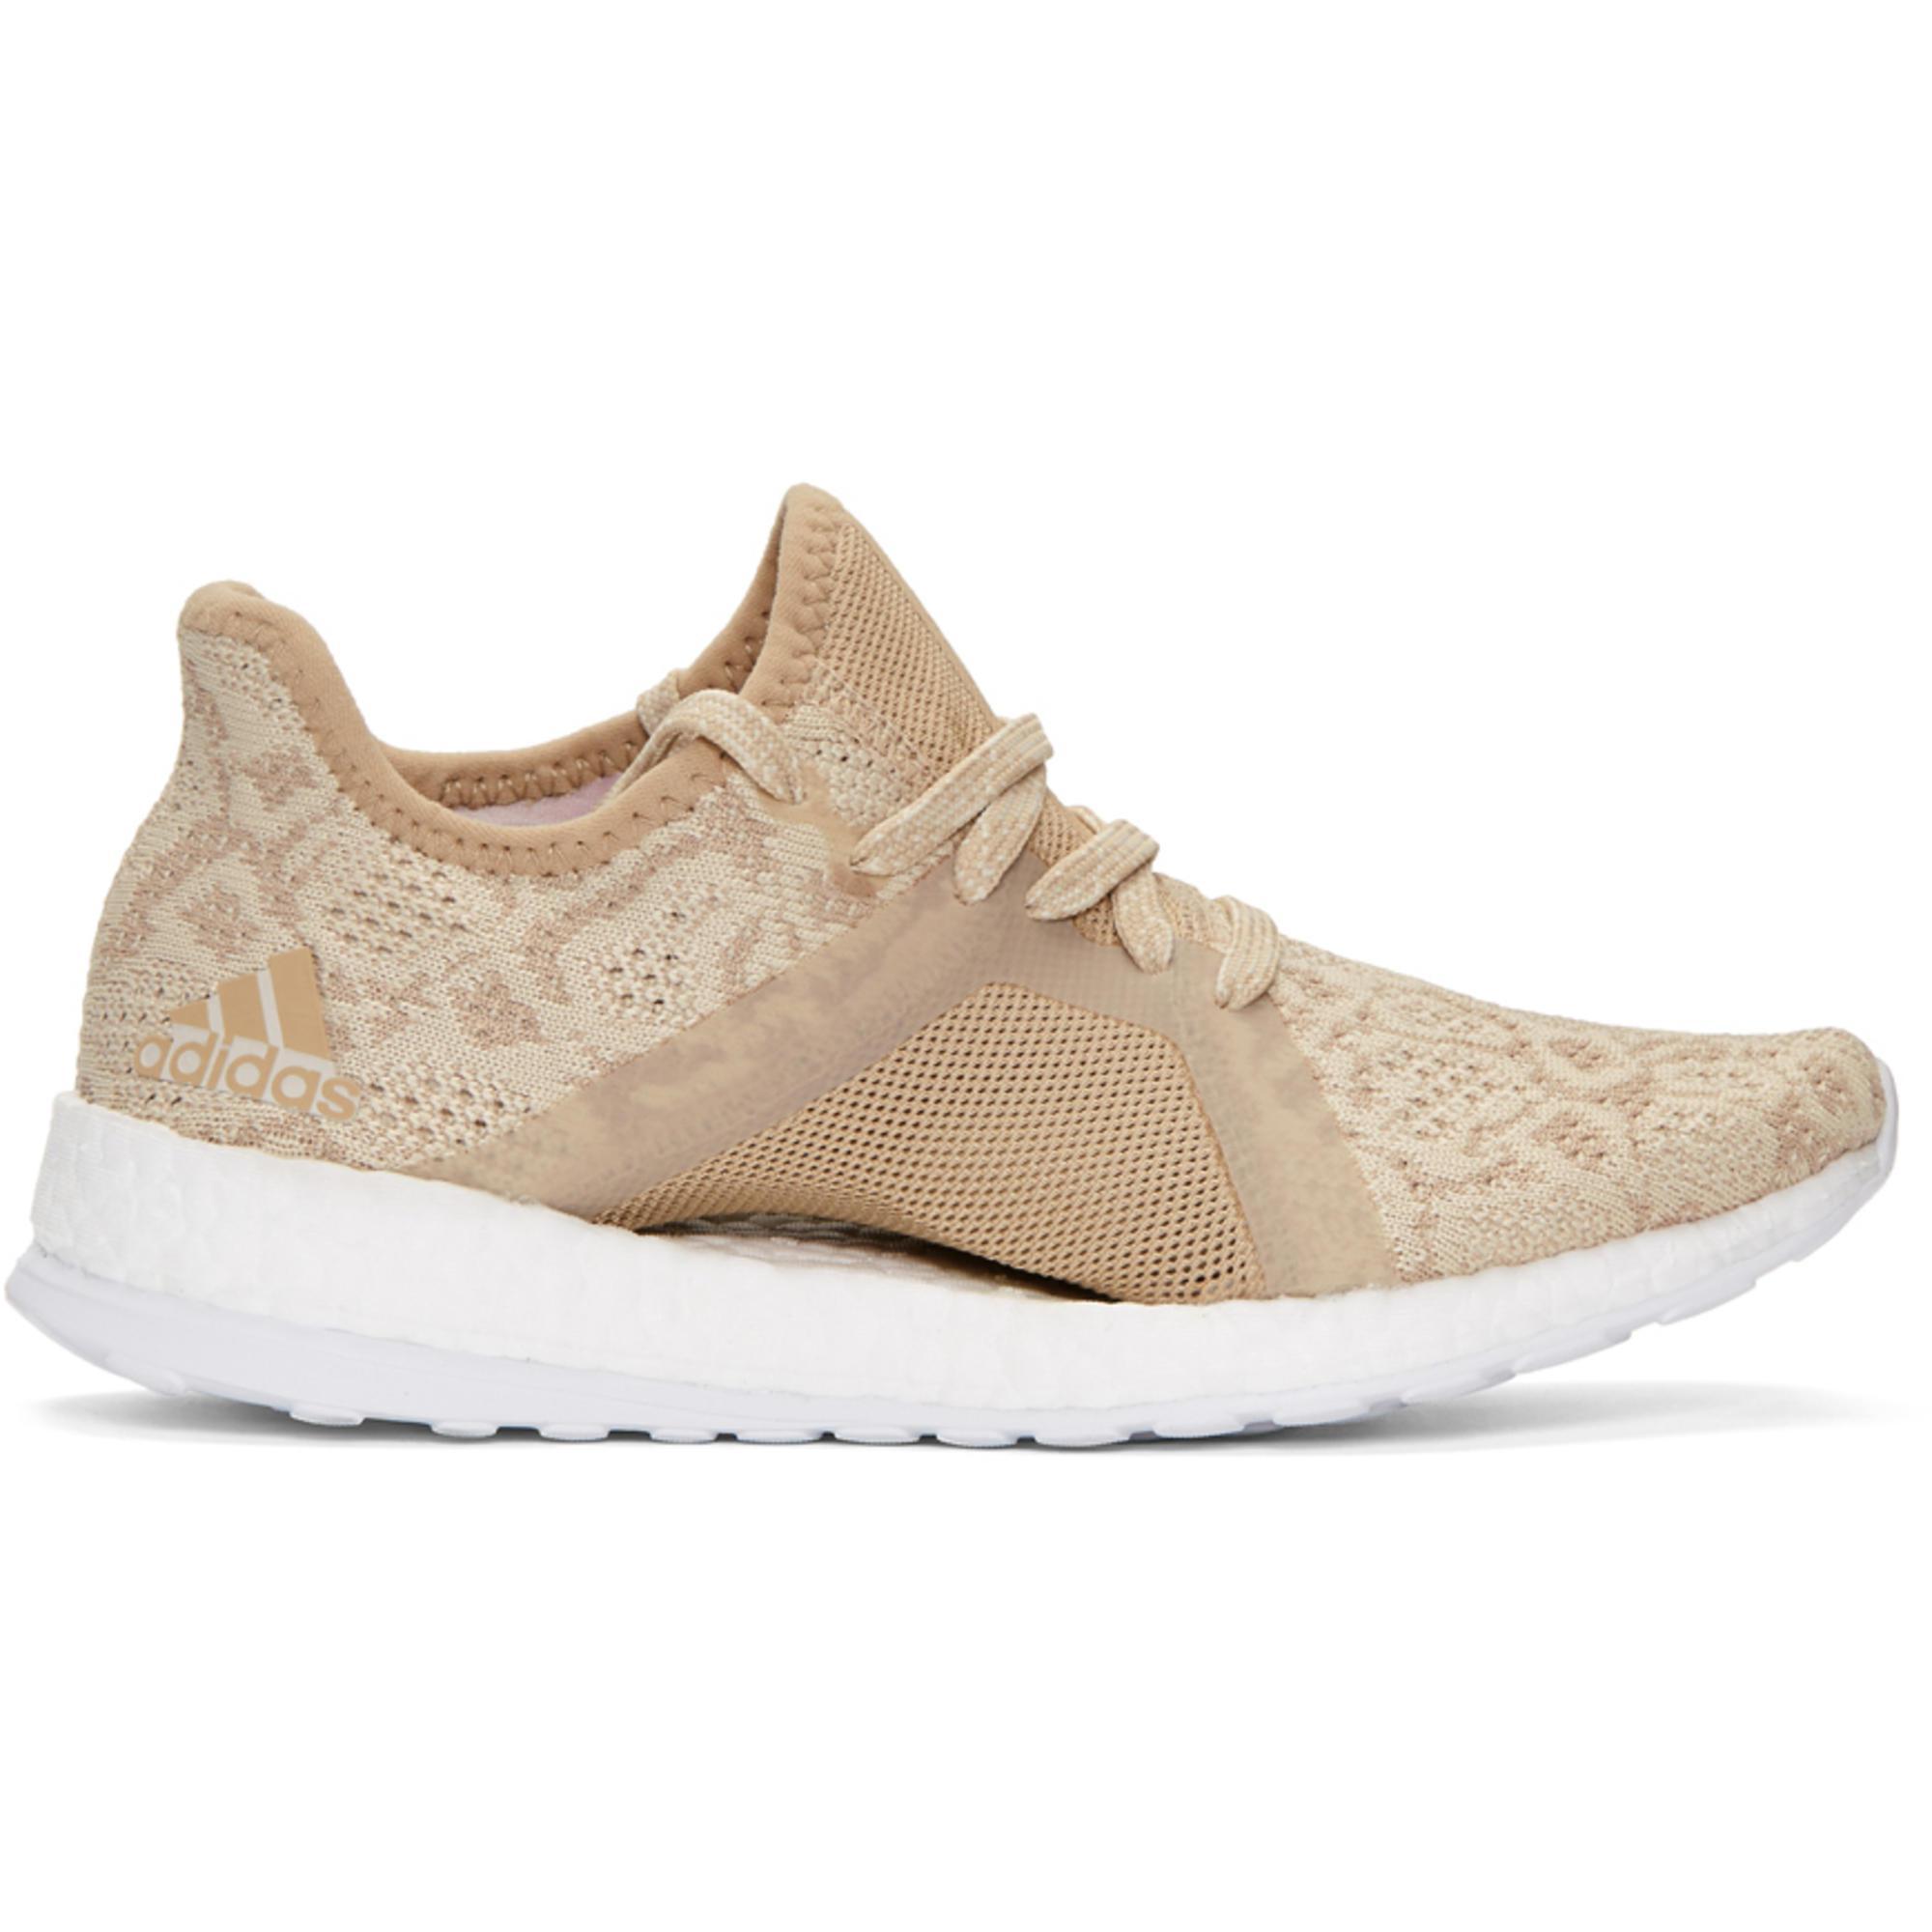 Beige PureBOOST x Element Sneakers adidas Originals xTdhiNn